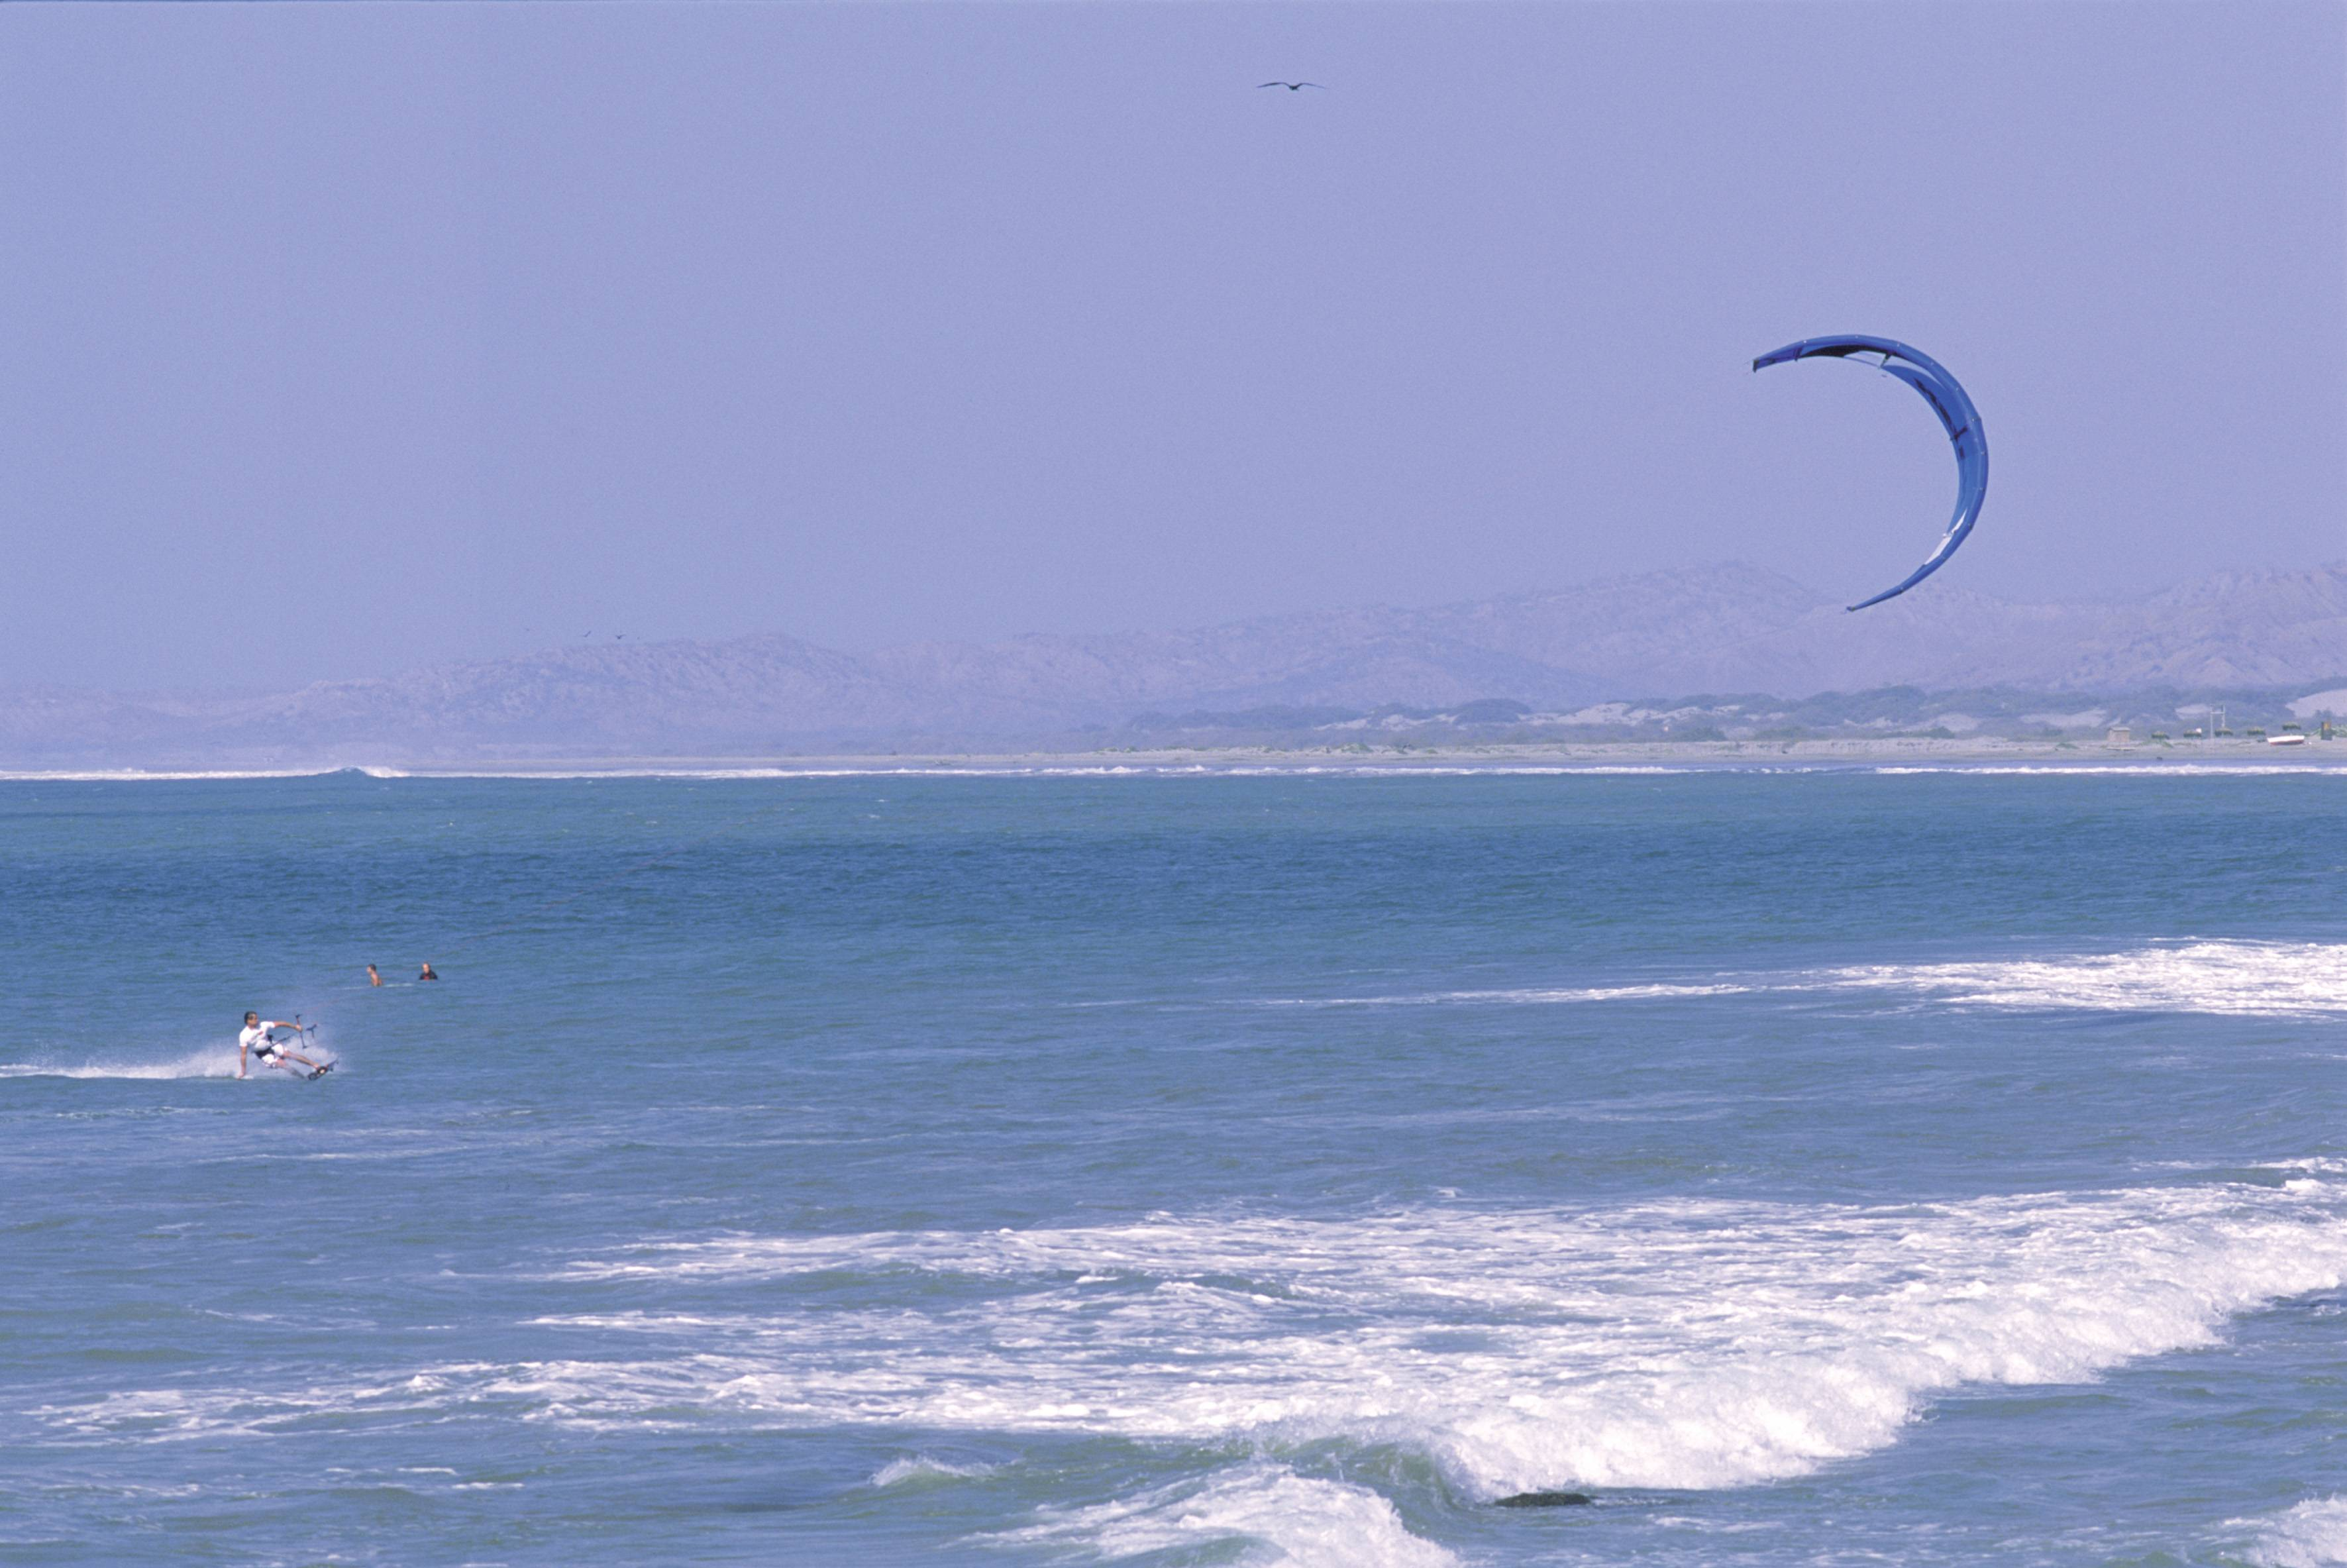 PromPeru Surf